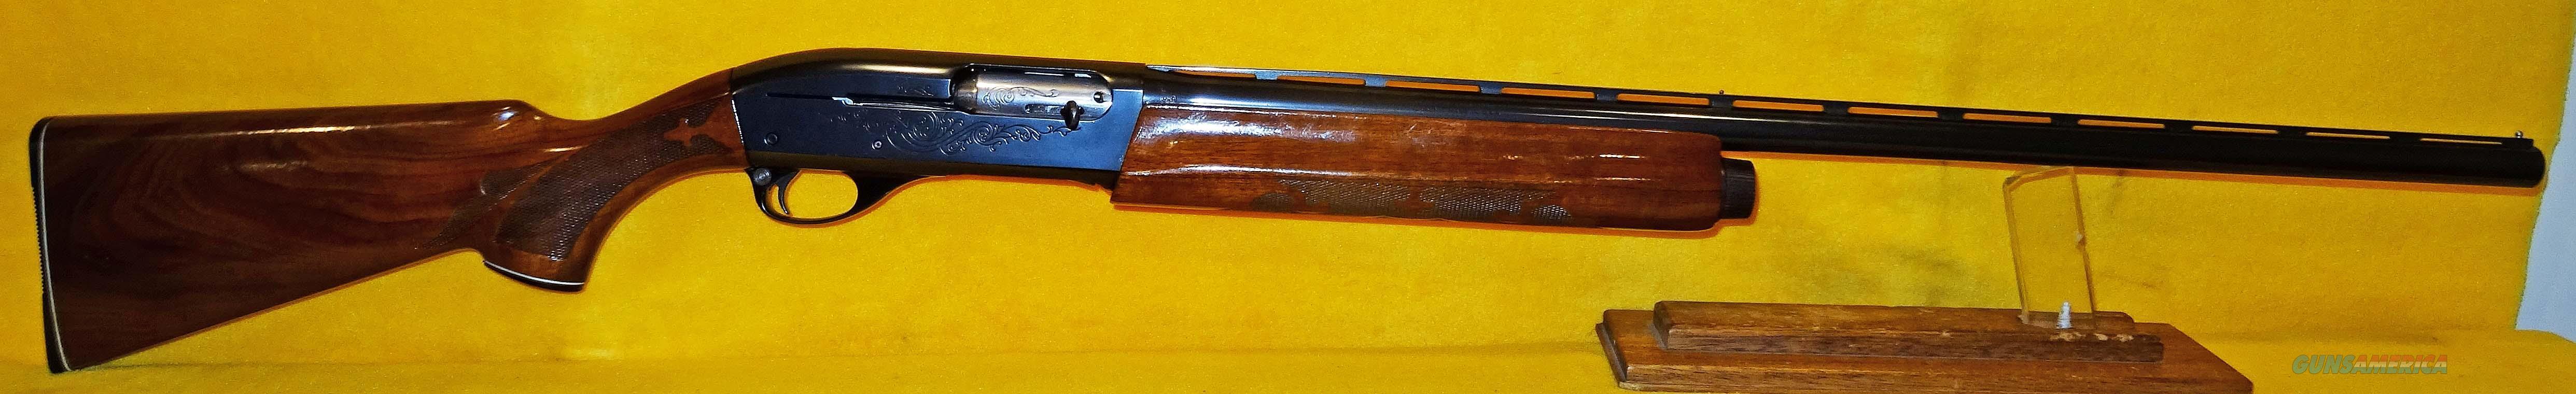 REMINGTON 1100  Guns > Shotguns > Remington Shotguns  > Autoloaders > Hunting